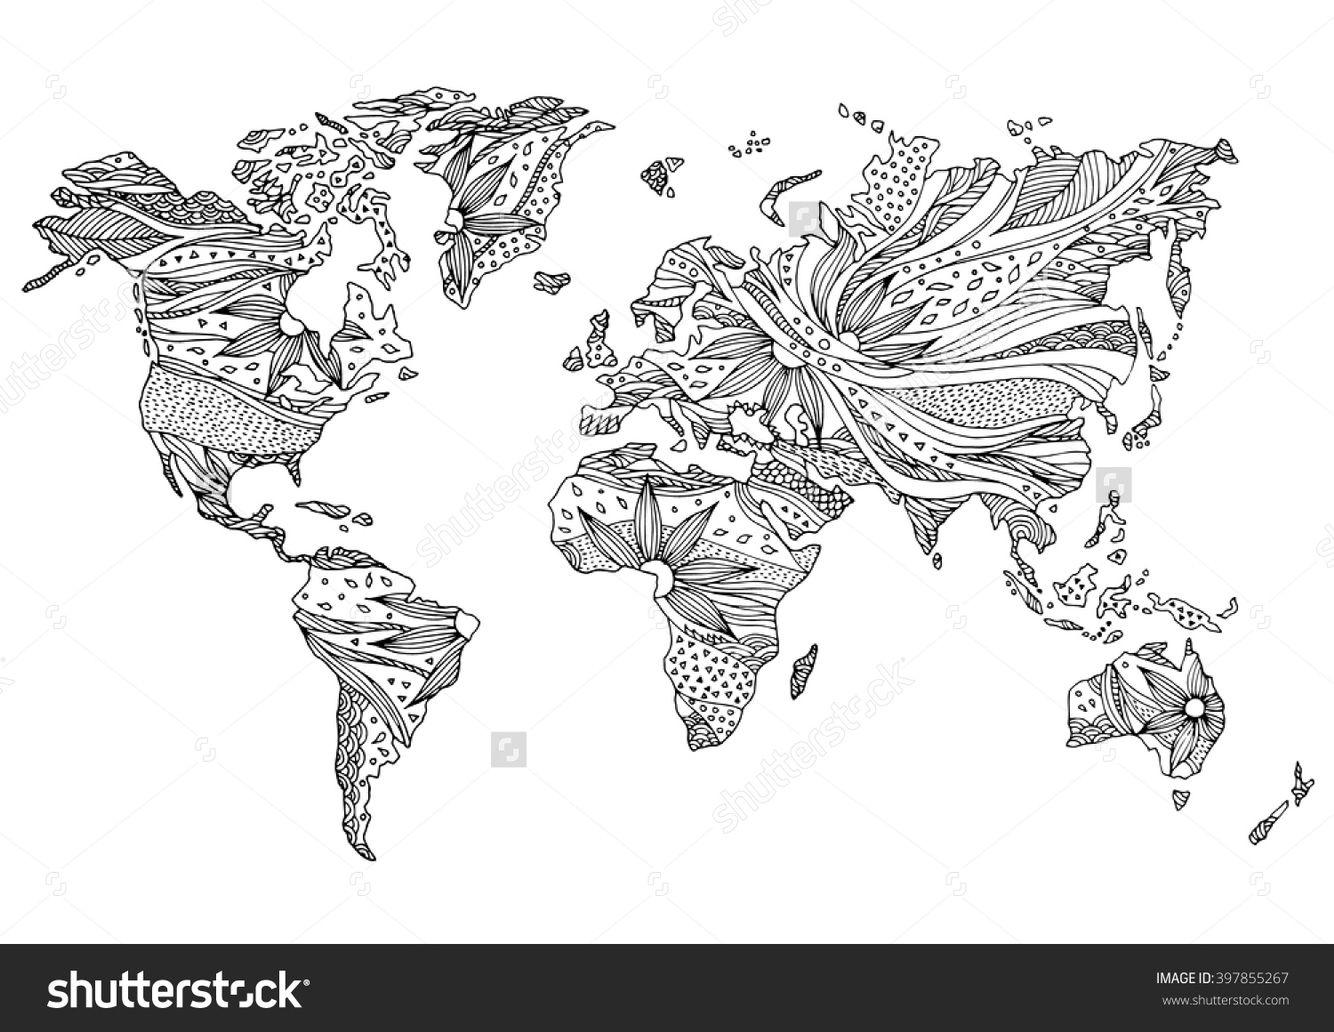 Hand drawn world map | Furnishings | Drawings, Tattoos, Map